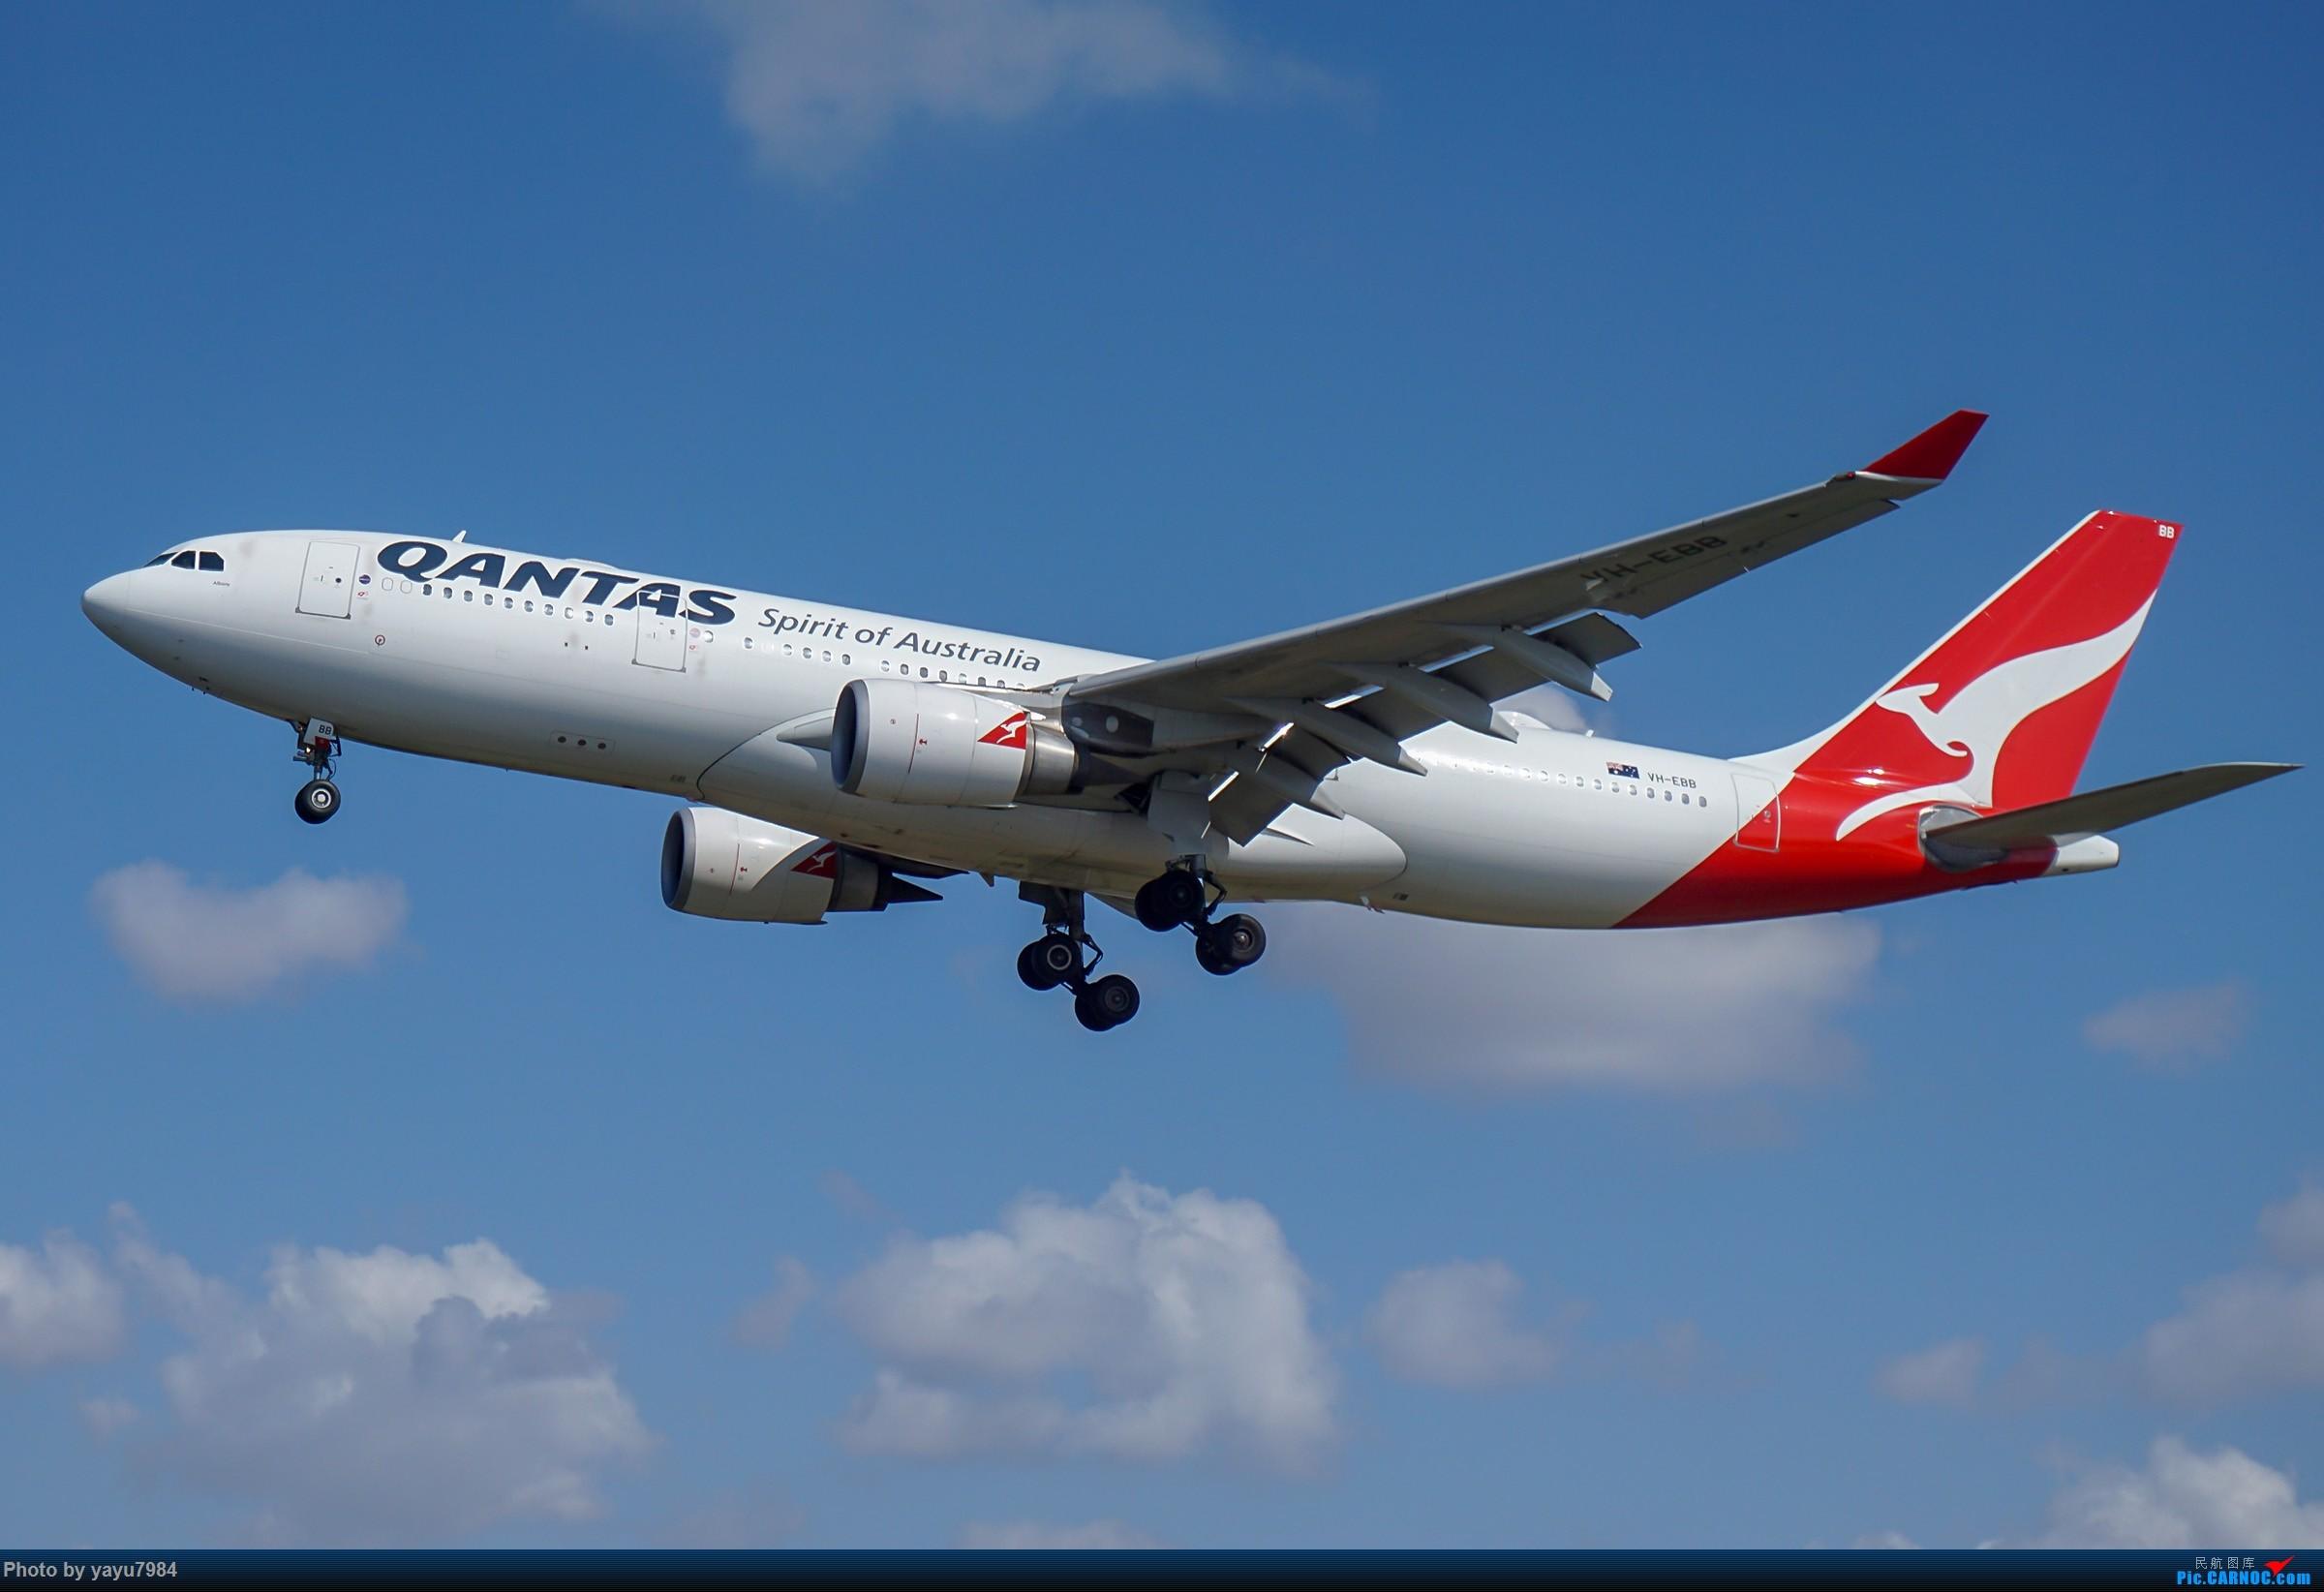 Re:[原创][SYD] 东航天合332,雪绒花343,华航蓝鹊,以及其他日常货 AIRBUS A330-200 VH-EBB 澳大利亚悉尼金斯福德·史密斯机场